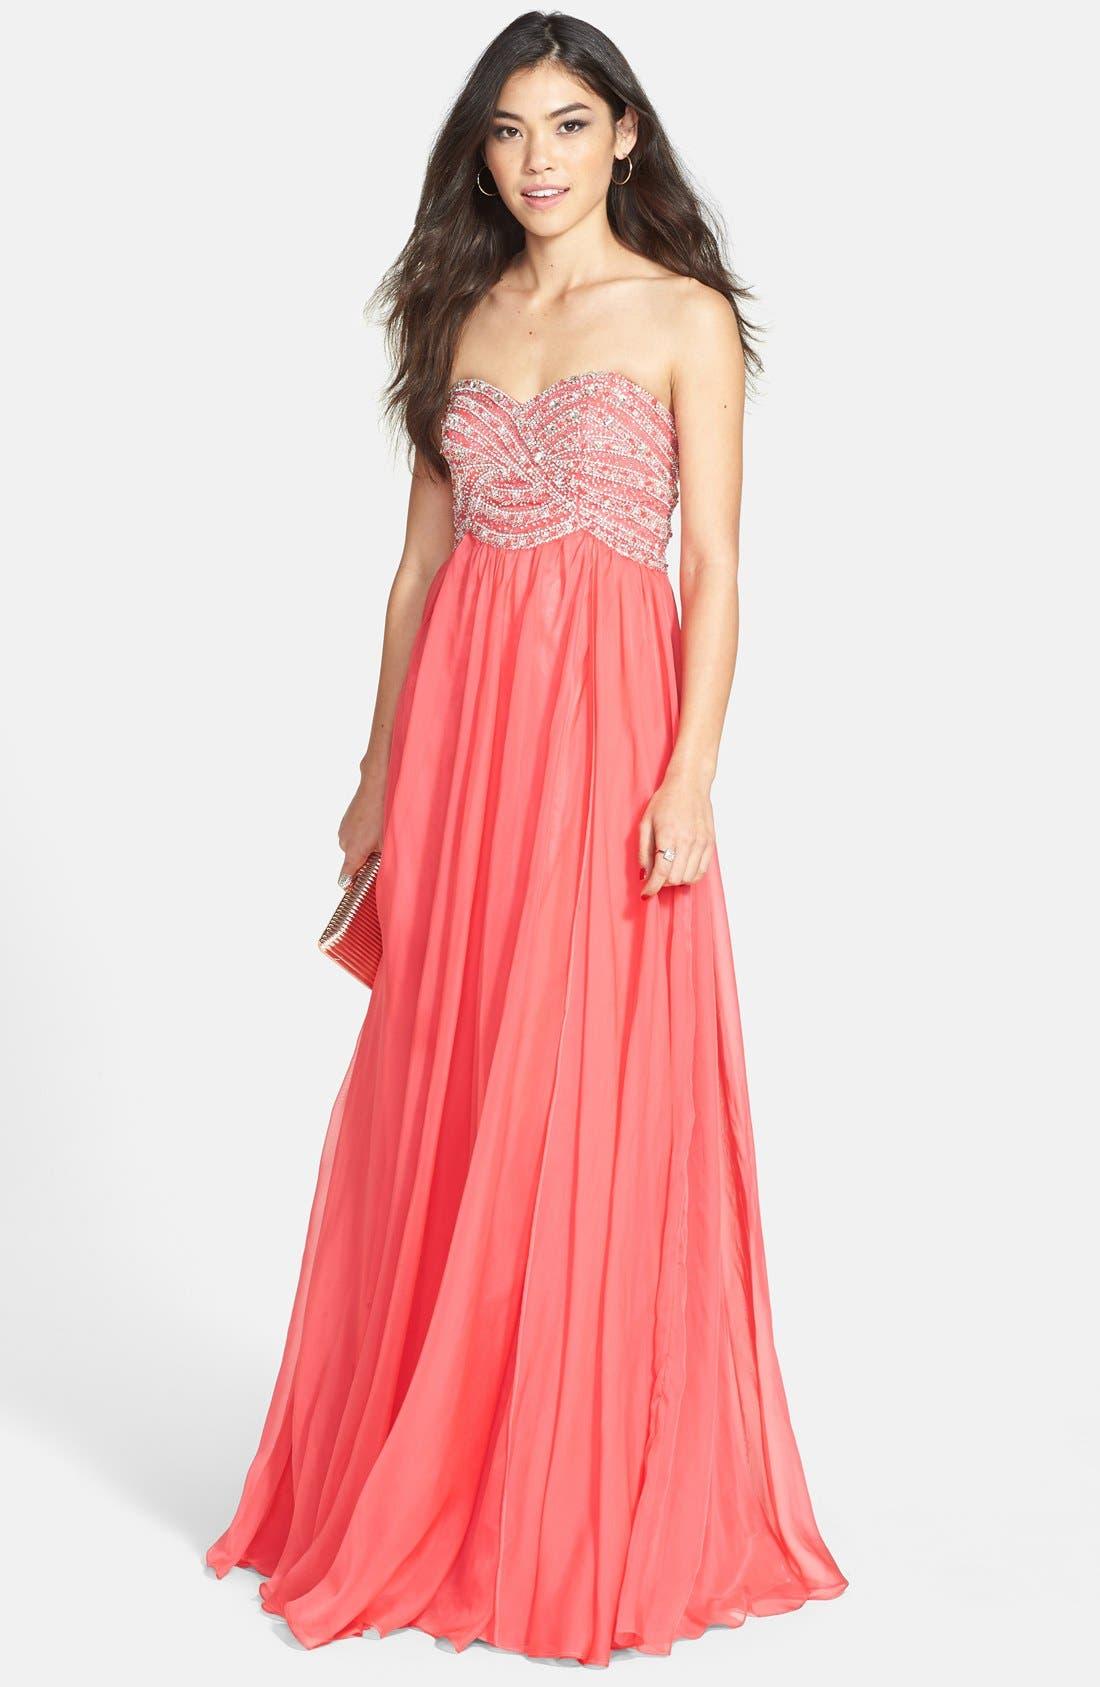 Main Image - Sherri Hill Embellished Bodice Chiffon Gown